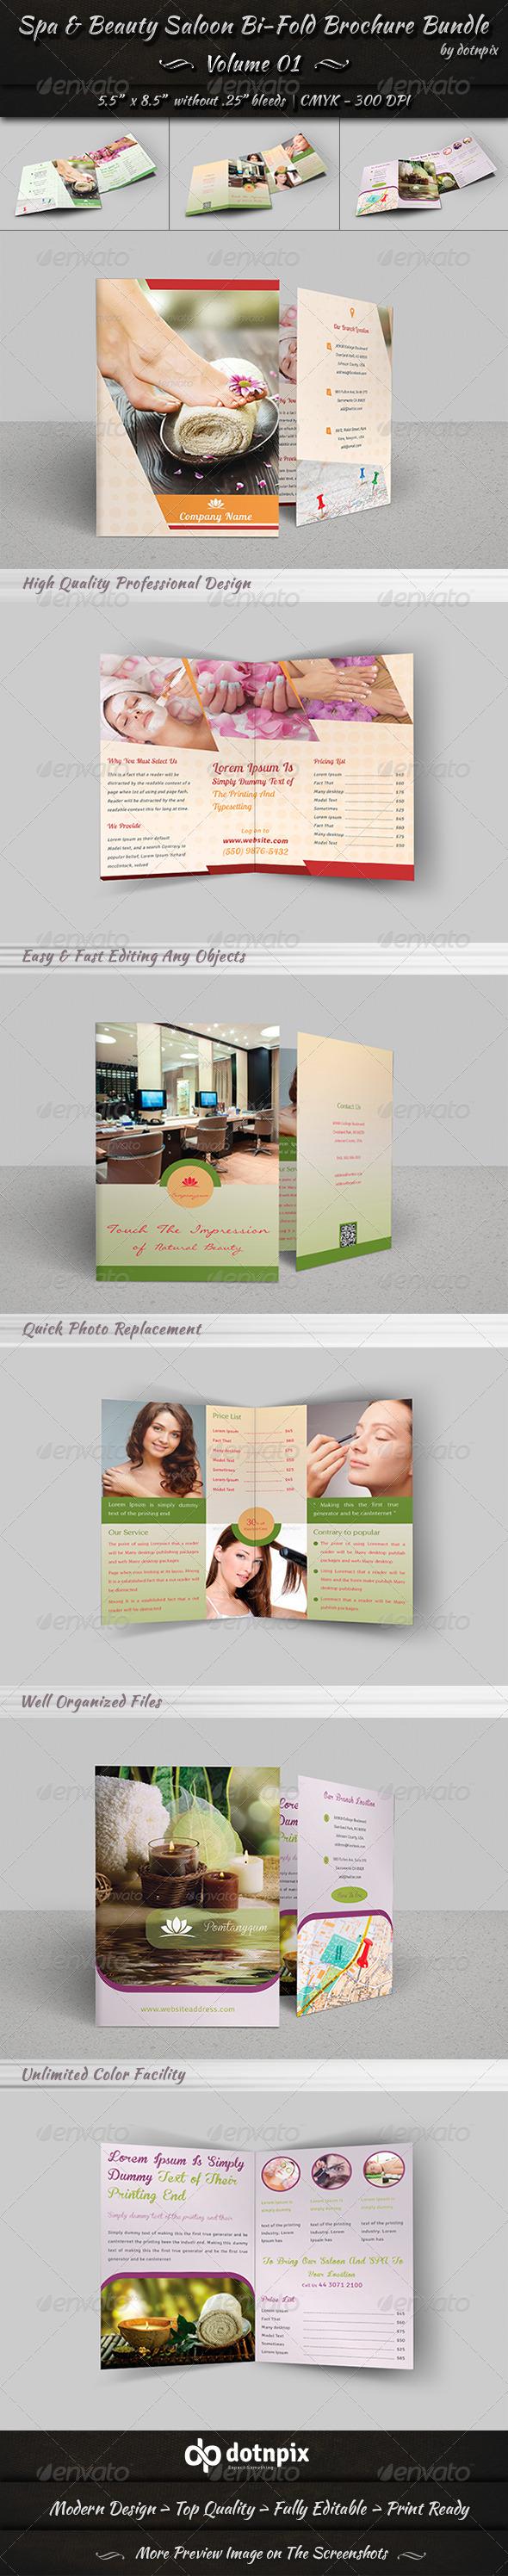 GraphicRiver Spa & Beauty Saloon Bi-Fold Brochure Bundle v1 8118282